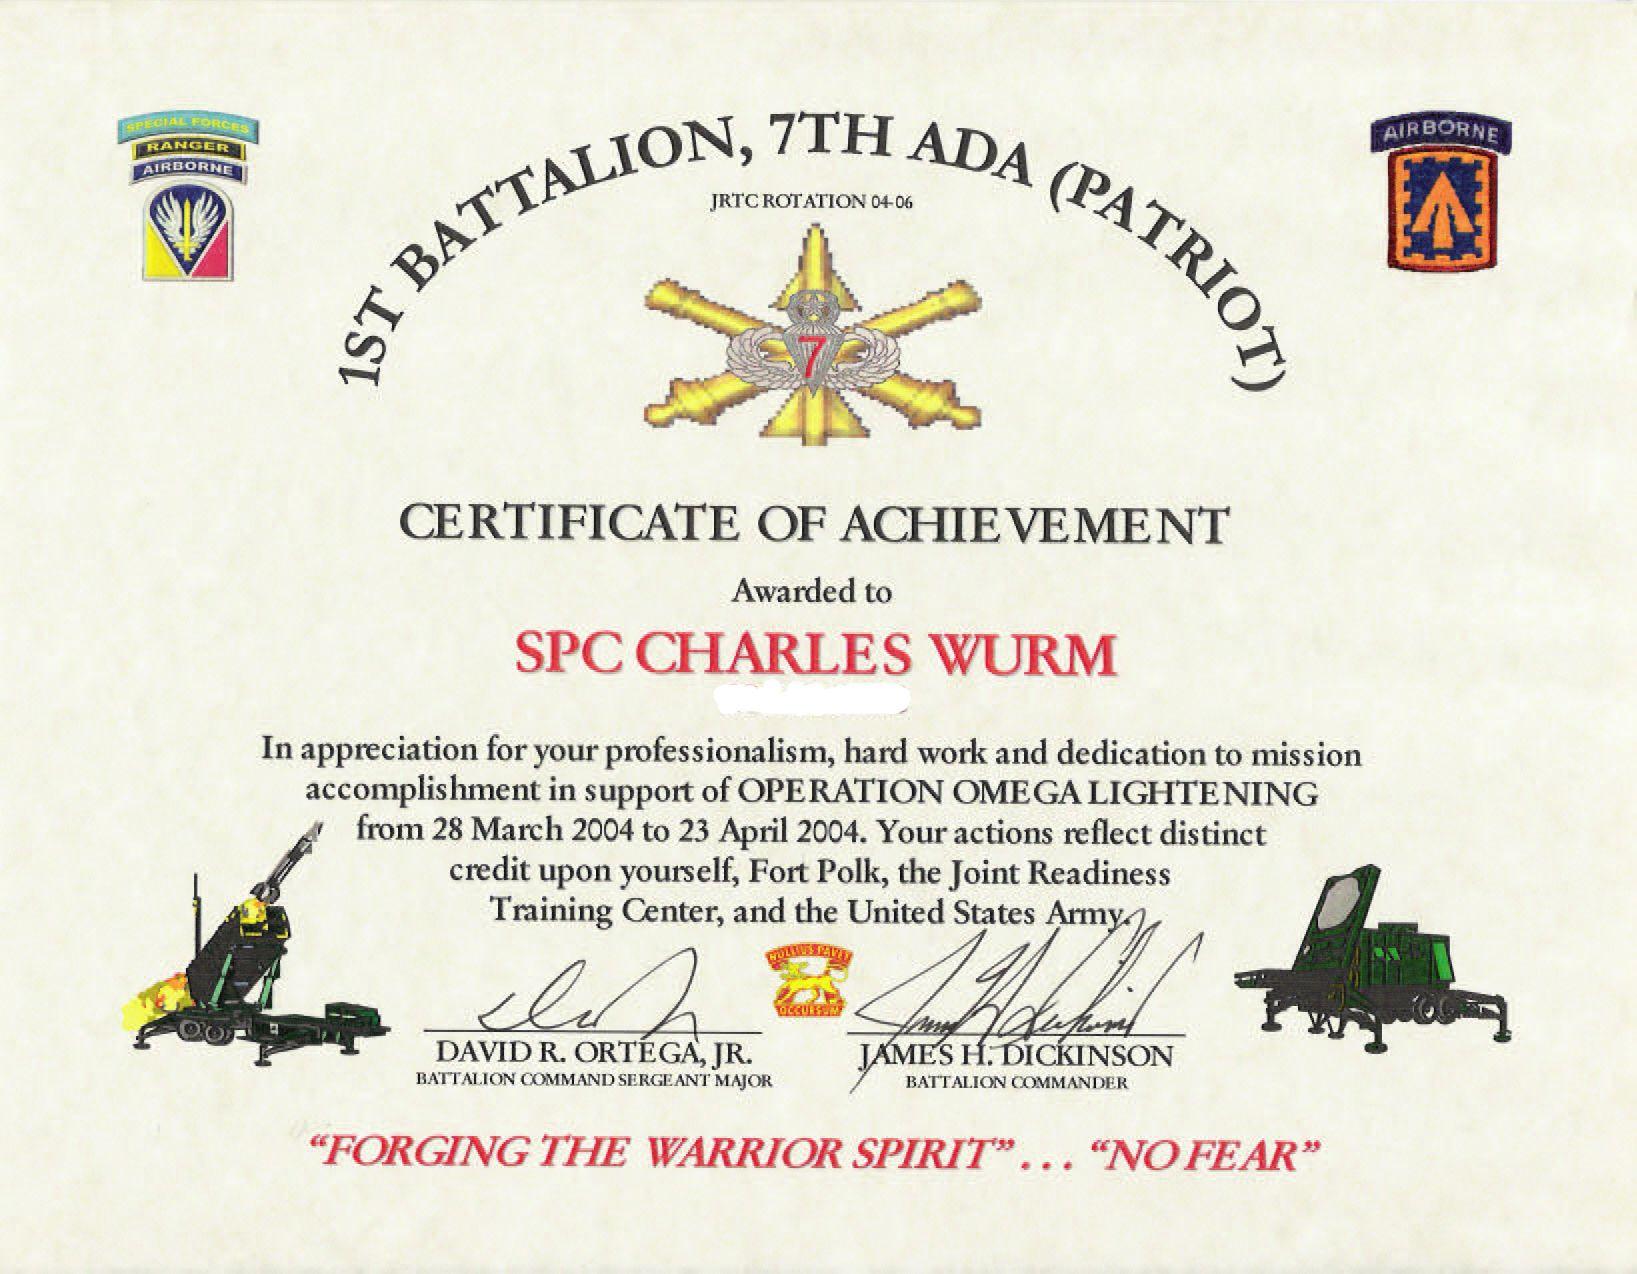 Education Awards Regarding Army Certificate Of Appreciation Certificate Of Achievement Template Certificate Of Achievement Certificate Of Completion Template Air force certificate of appreciation template